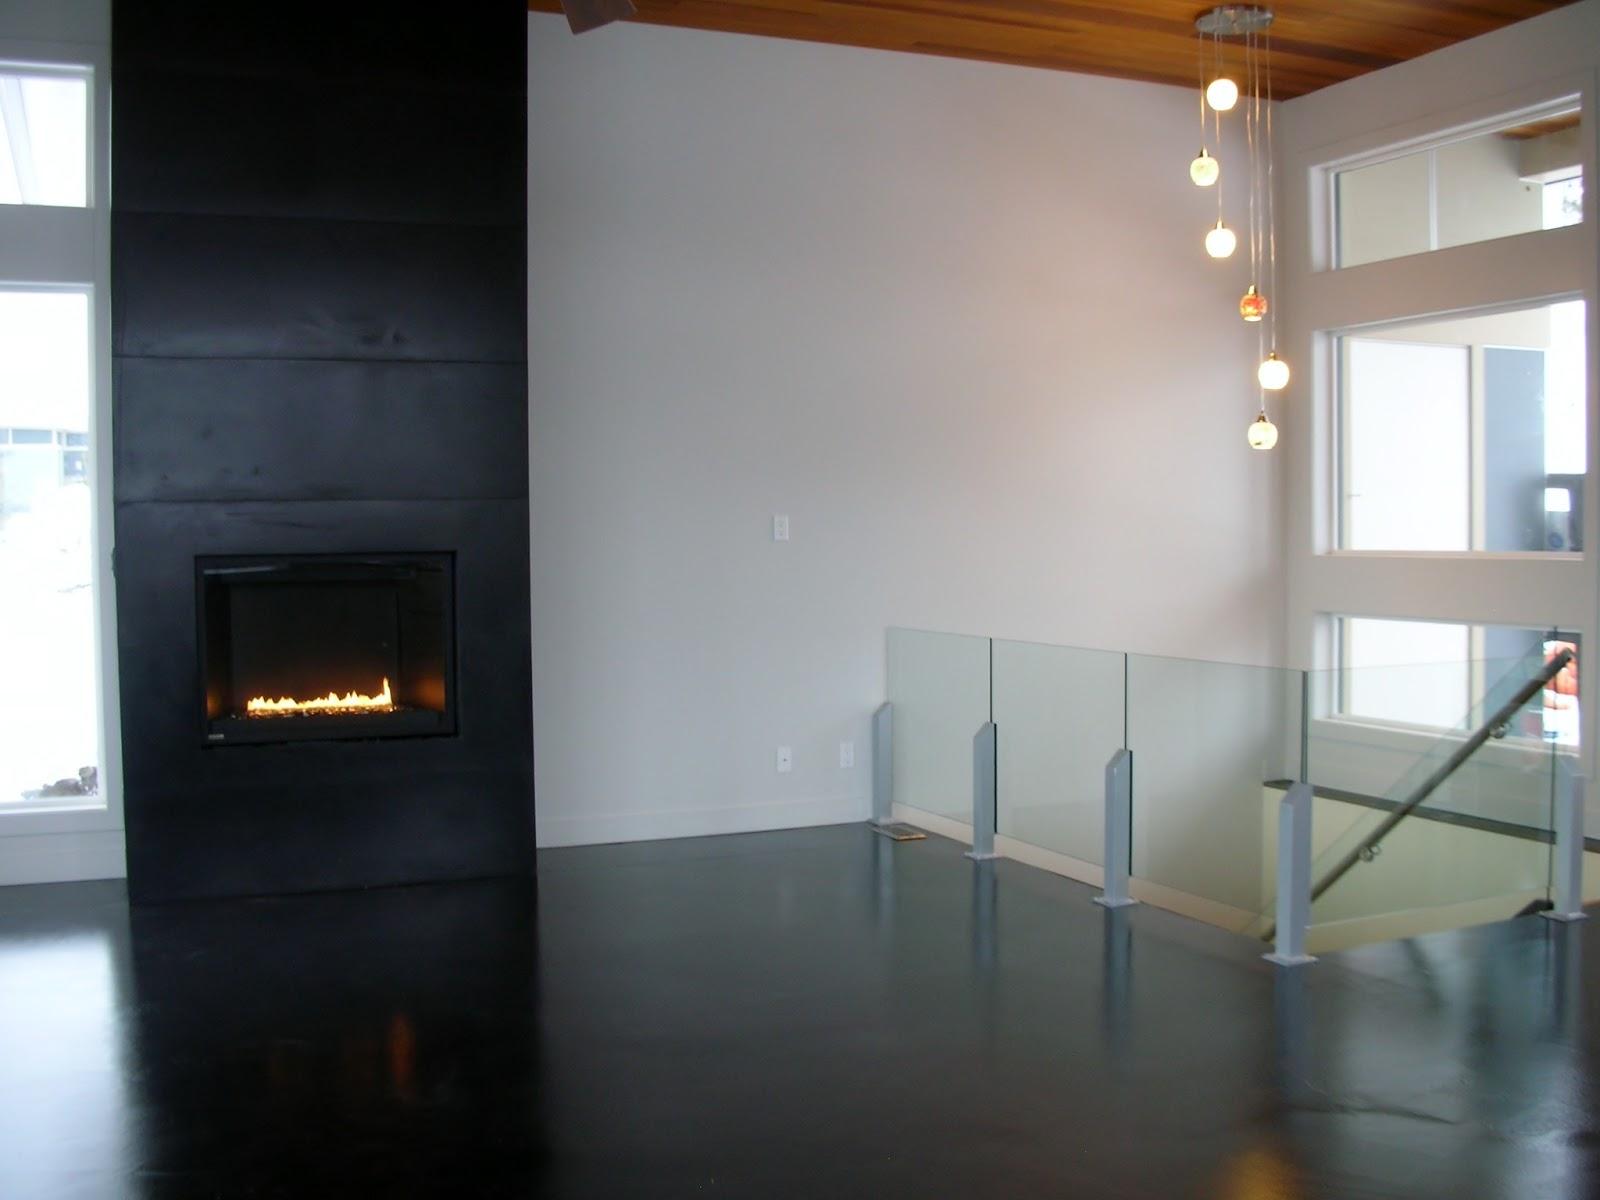 MODE CONCRETE Contemporary Concrete Floors on the Main Floor our